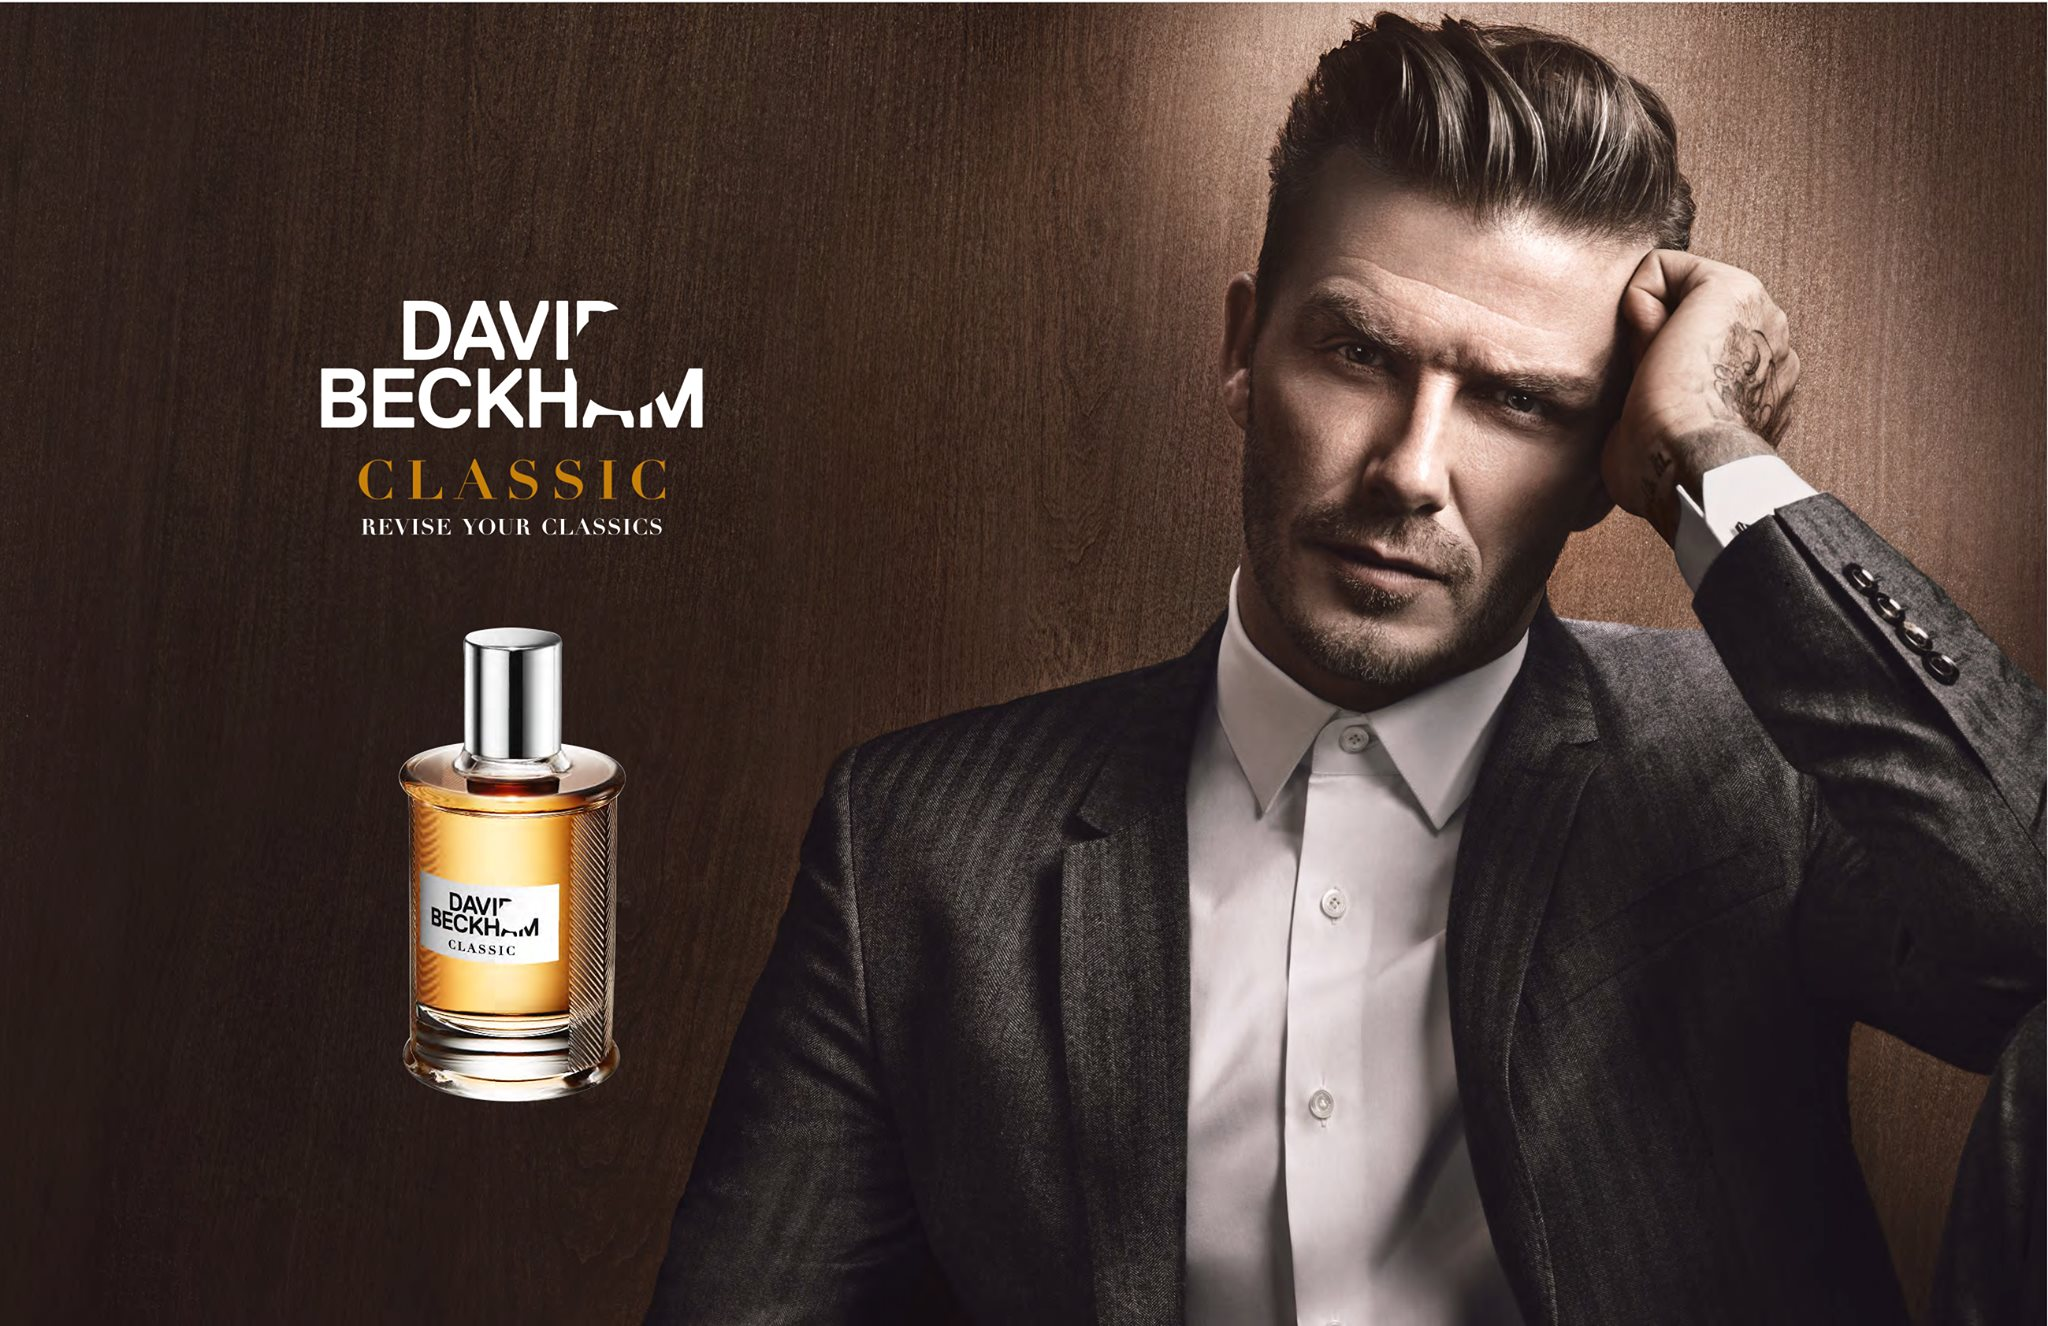 David-Beckham-classic.jpg